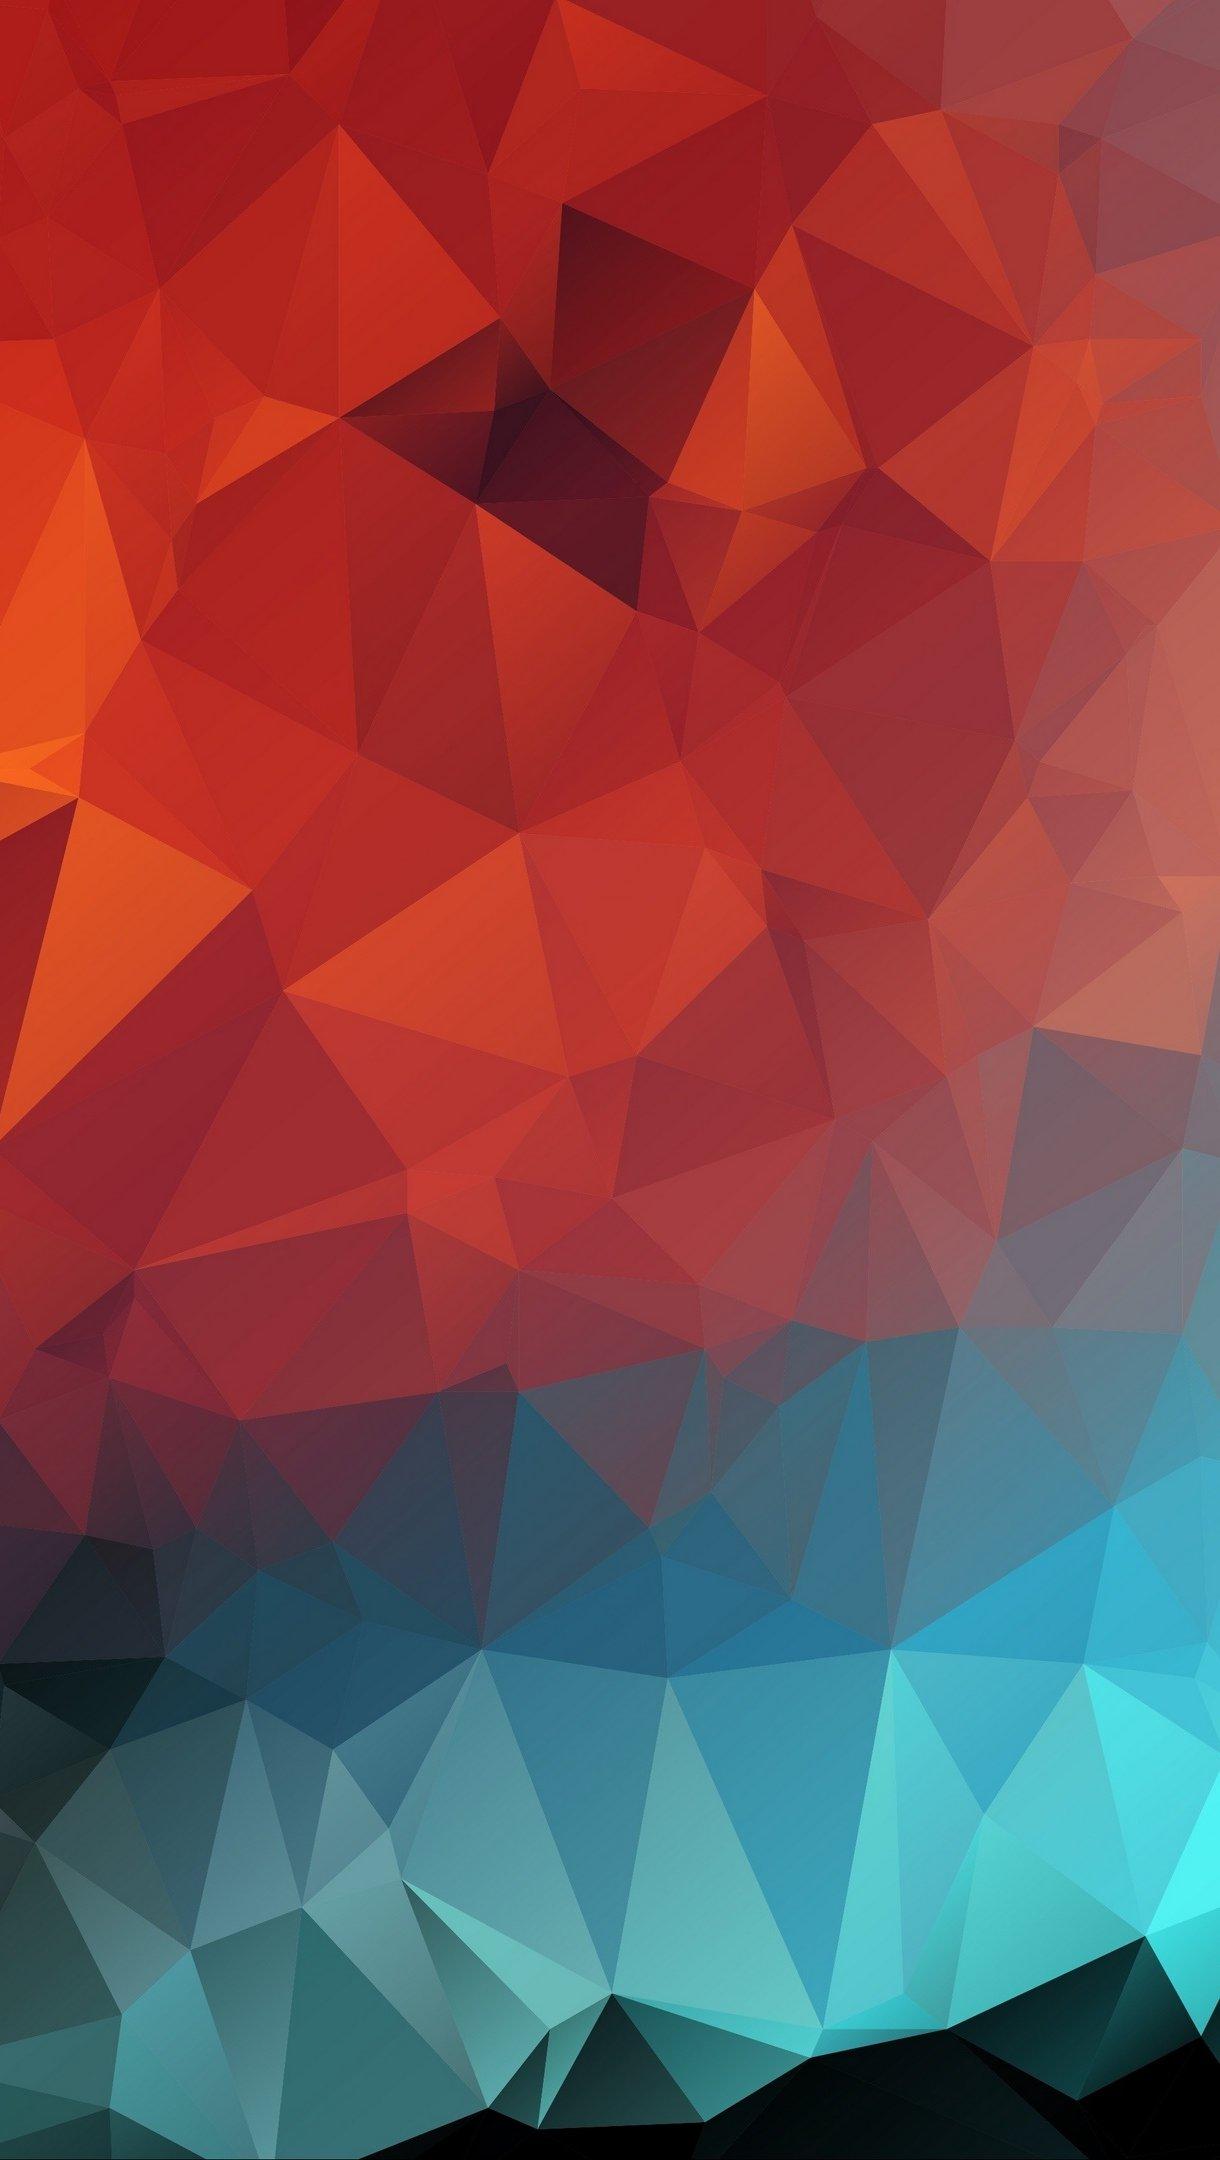 Wallpaper Polygons Low-poly Art Vertical